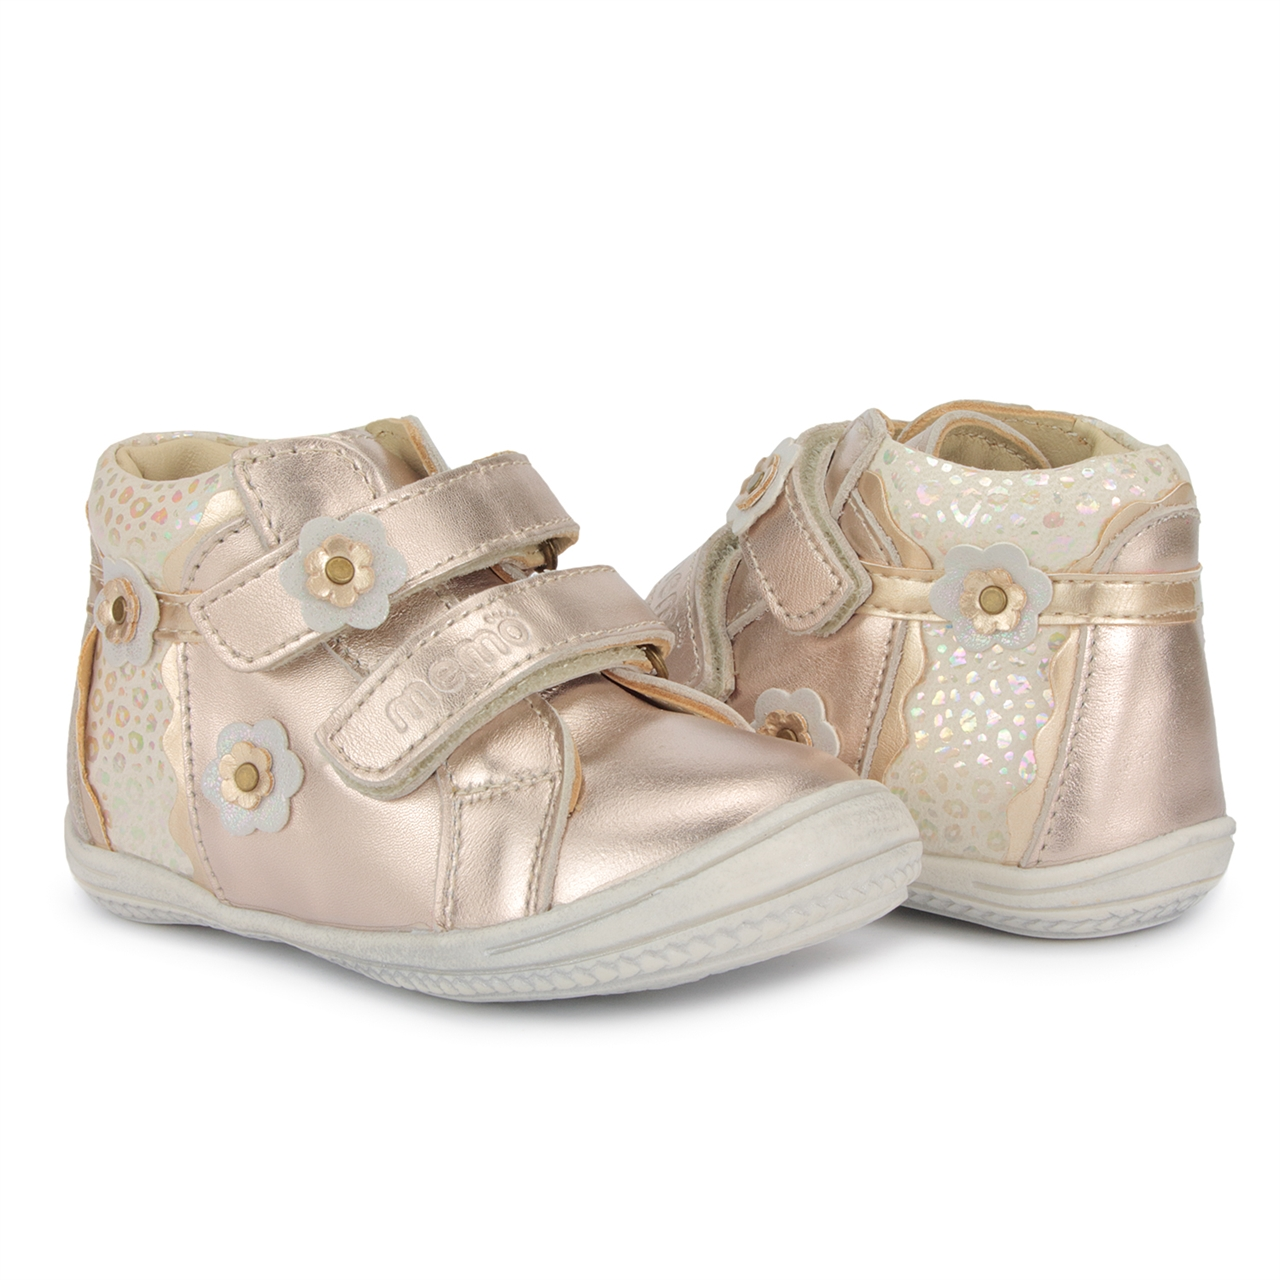 Memo Shoes. Memo Bella 3FD First